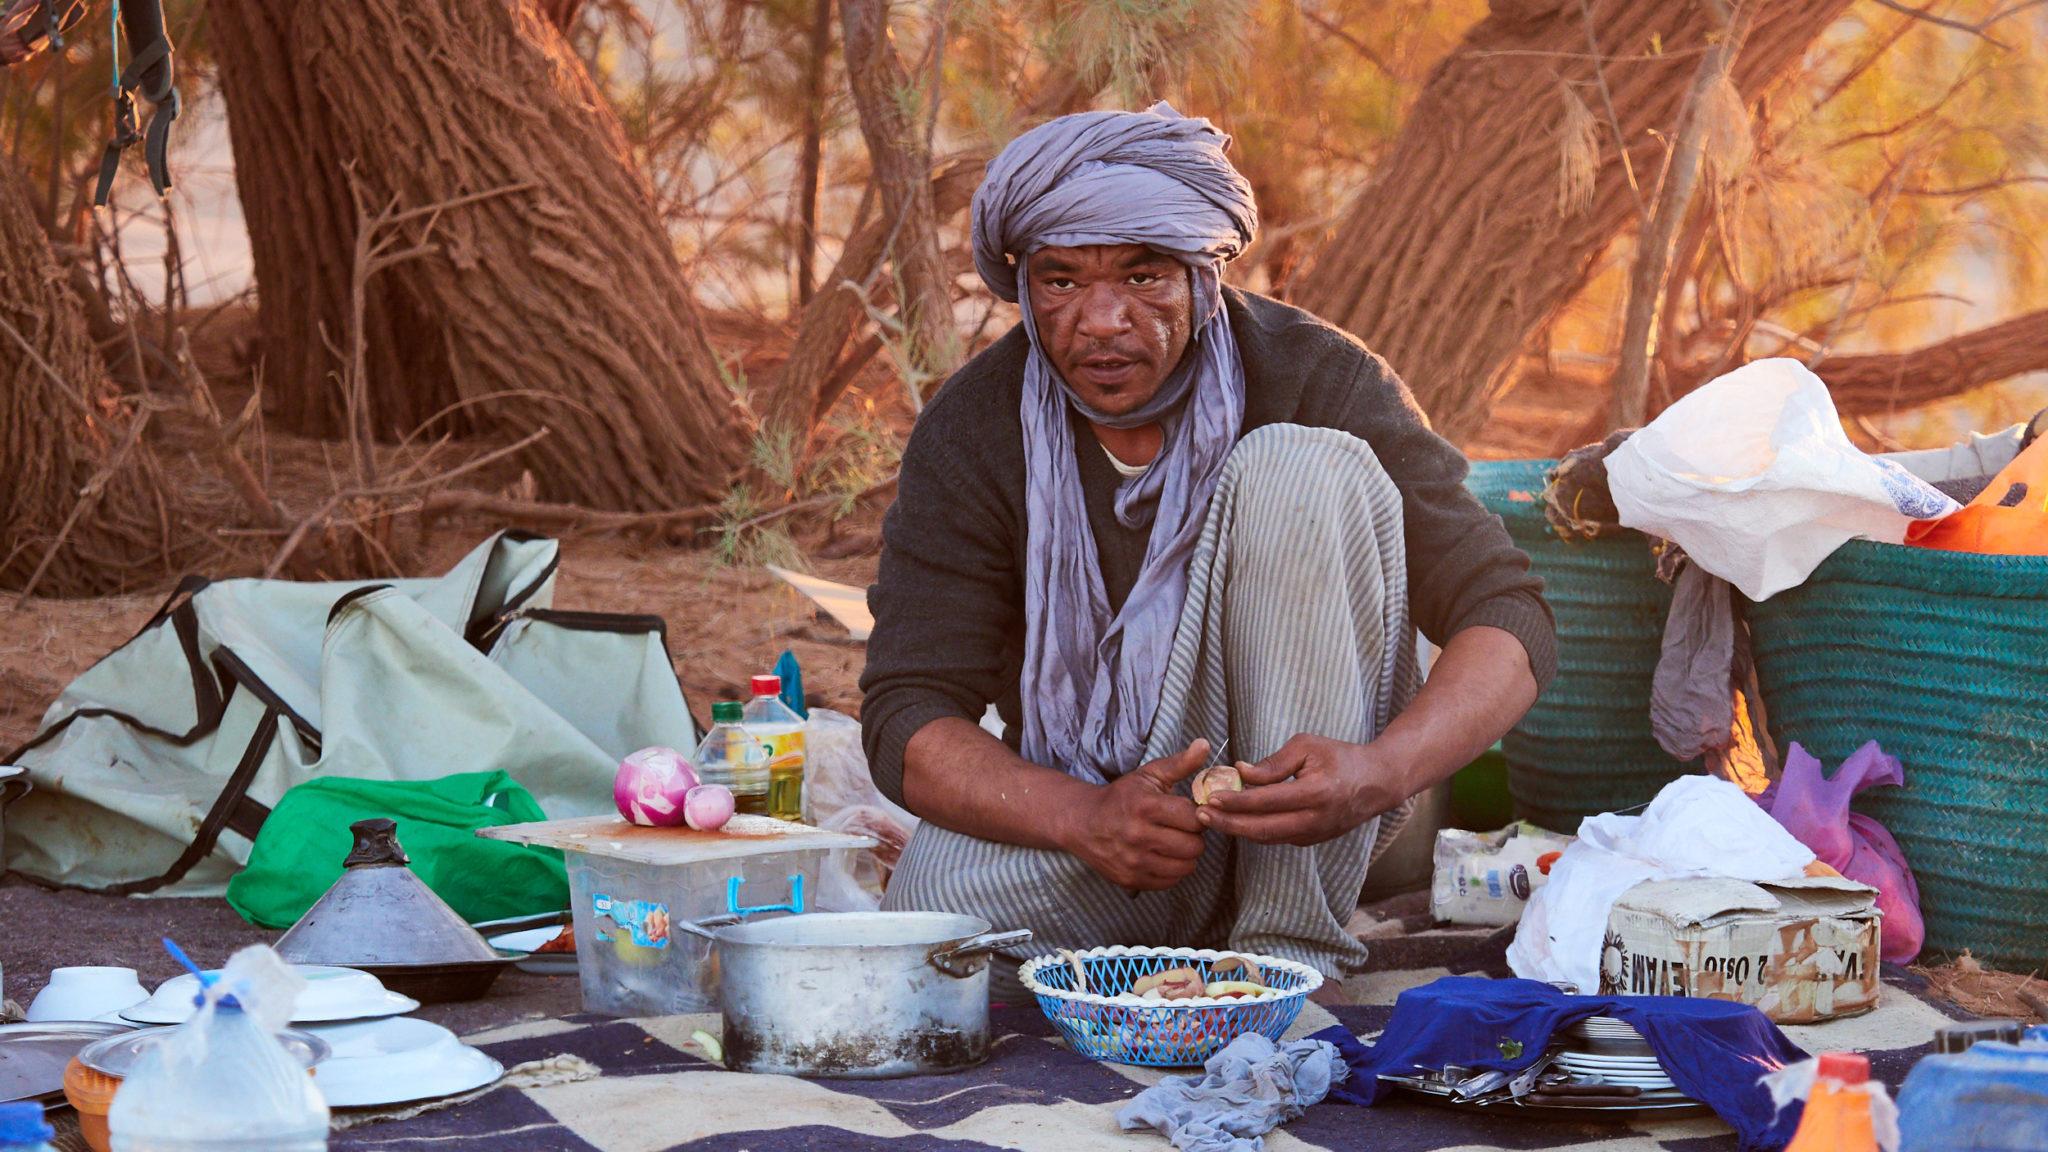 podpera marokko reportage 2017 a312711